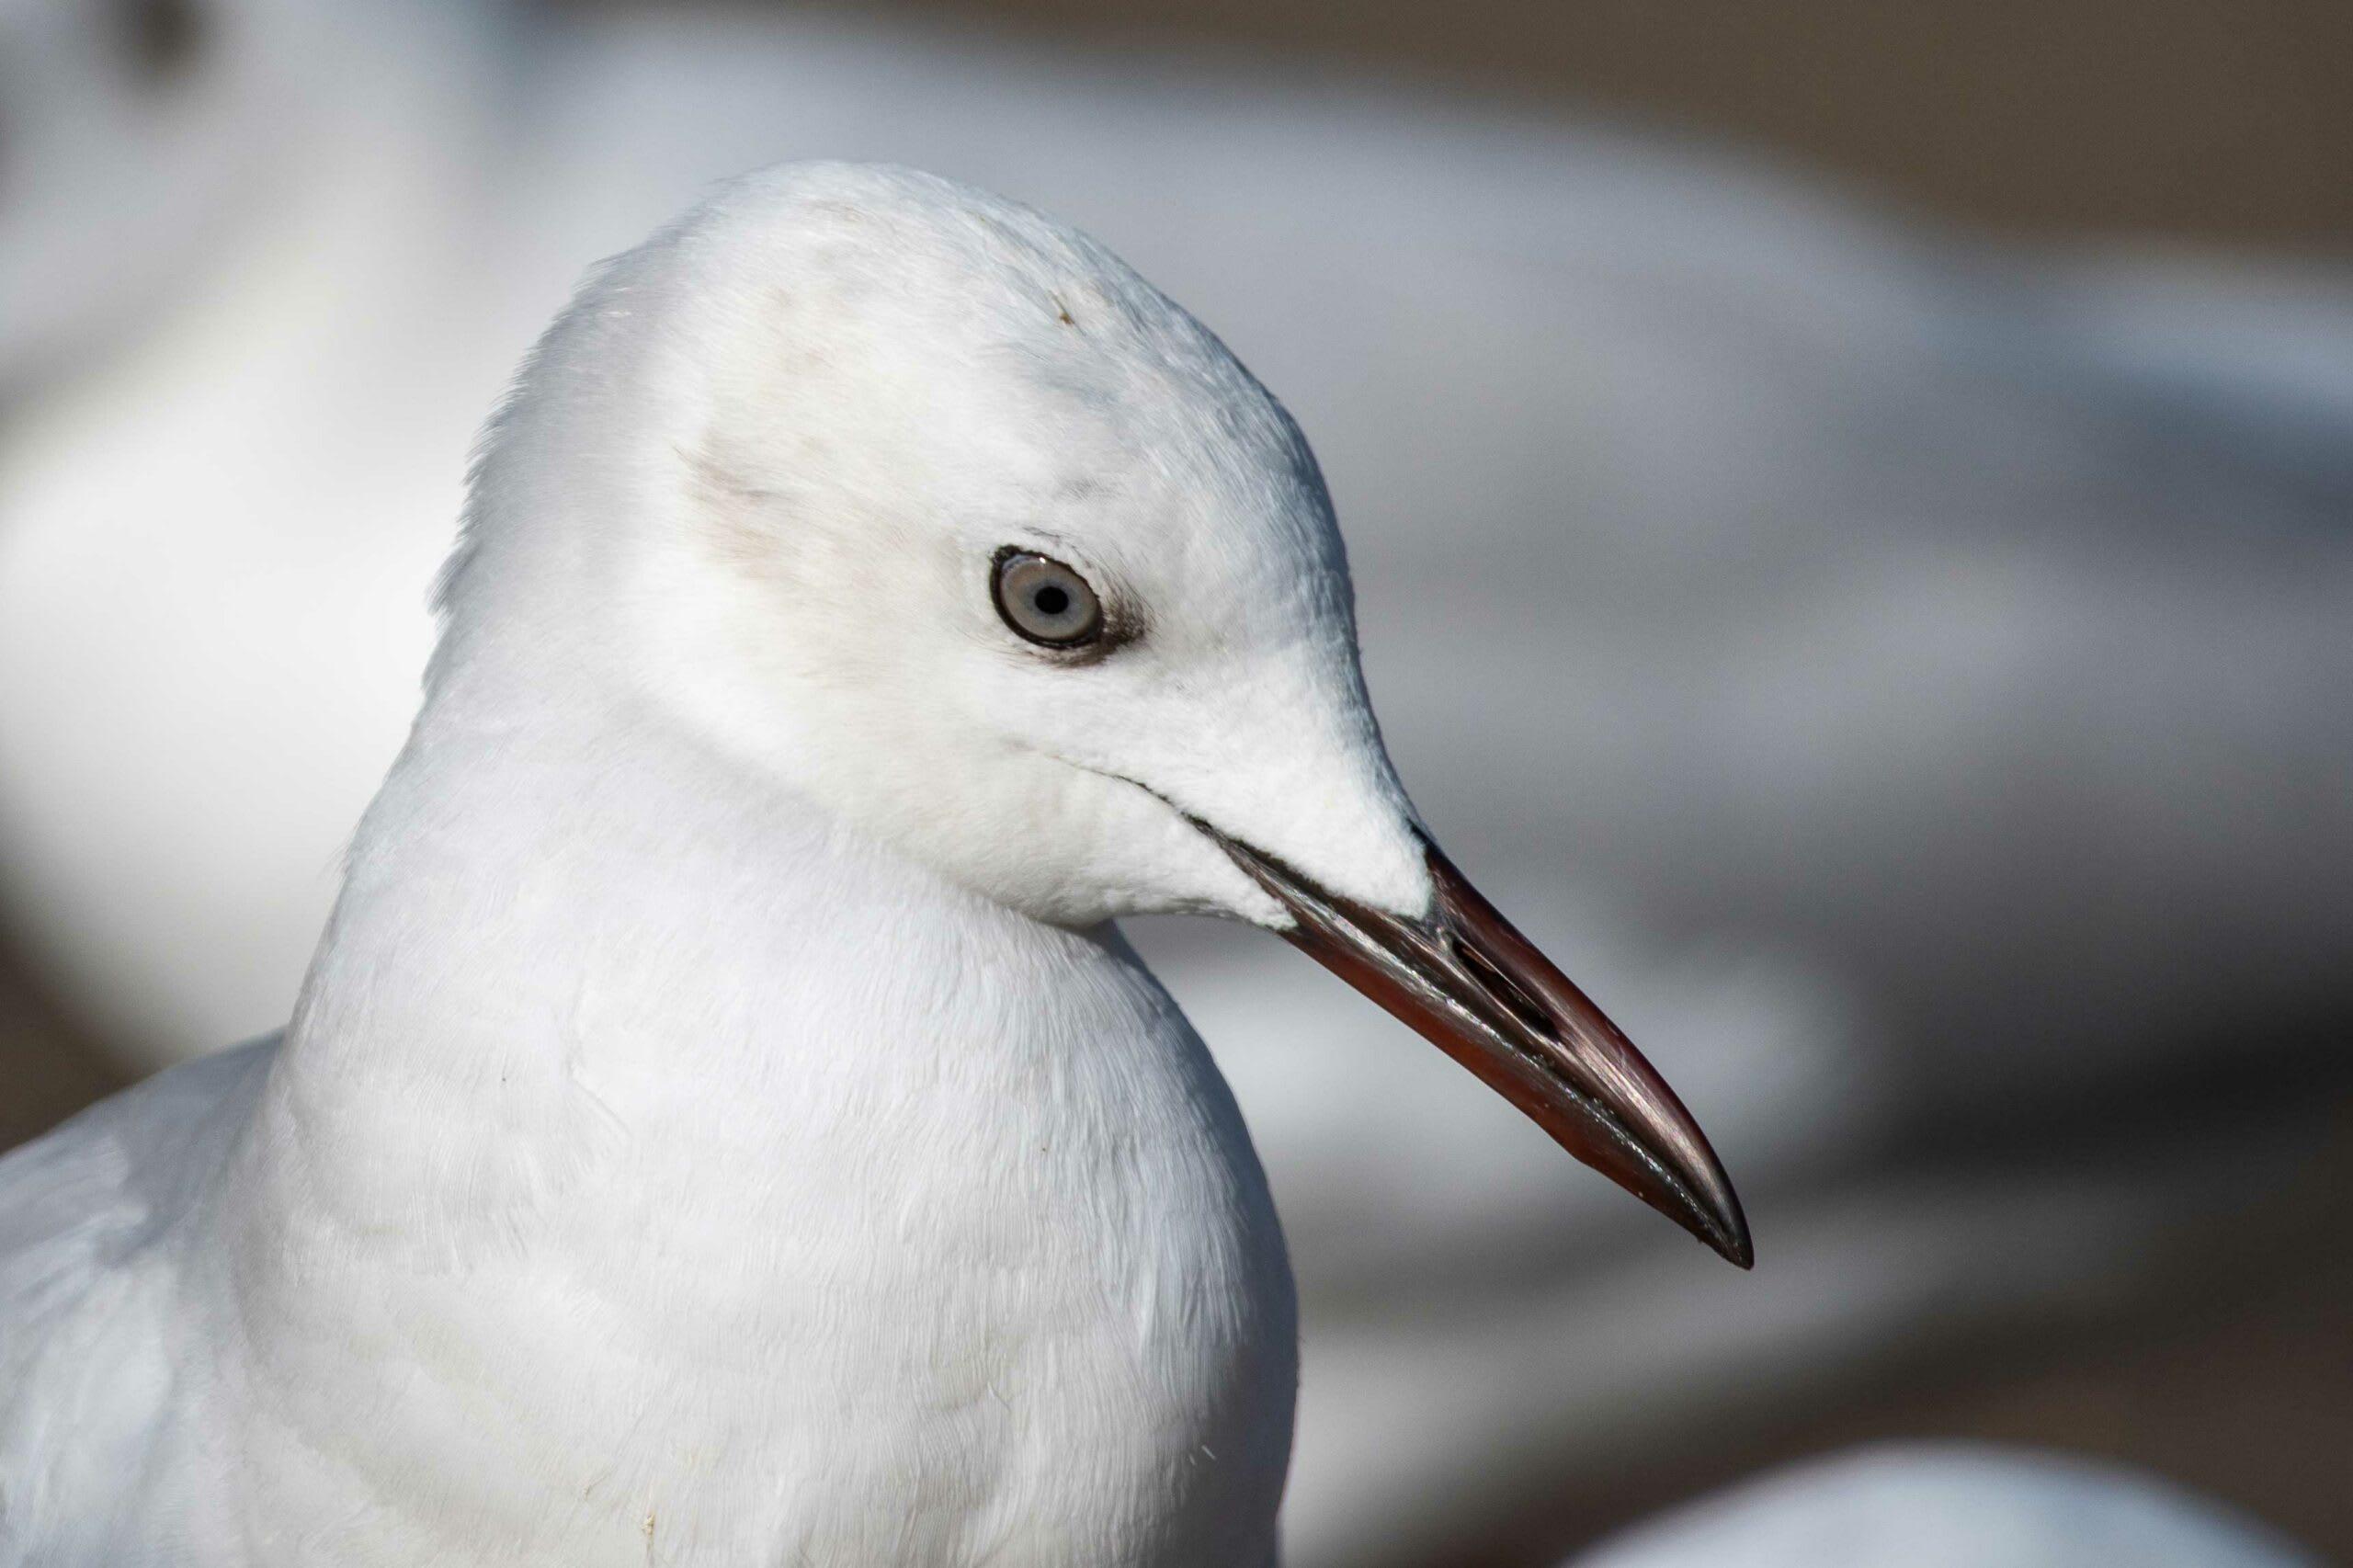 gujarat-slender-billed-gull-close-up